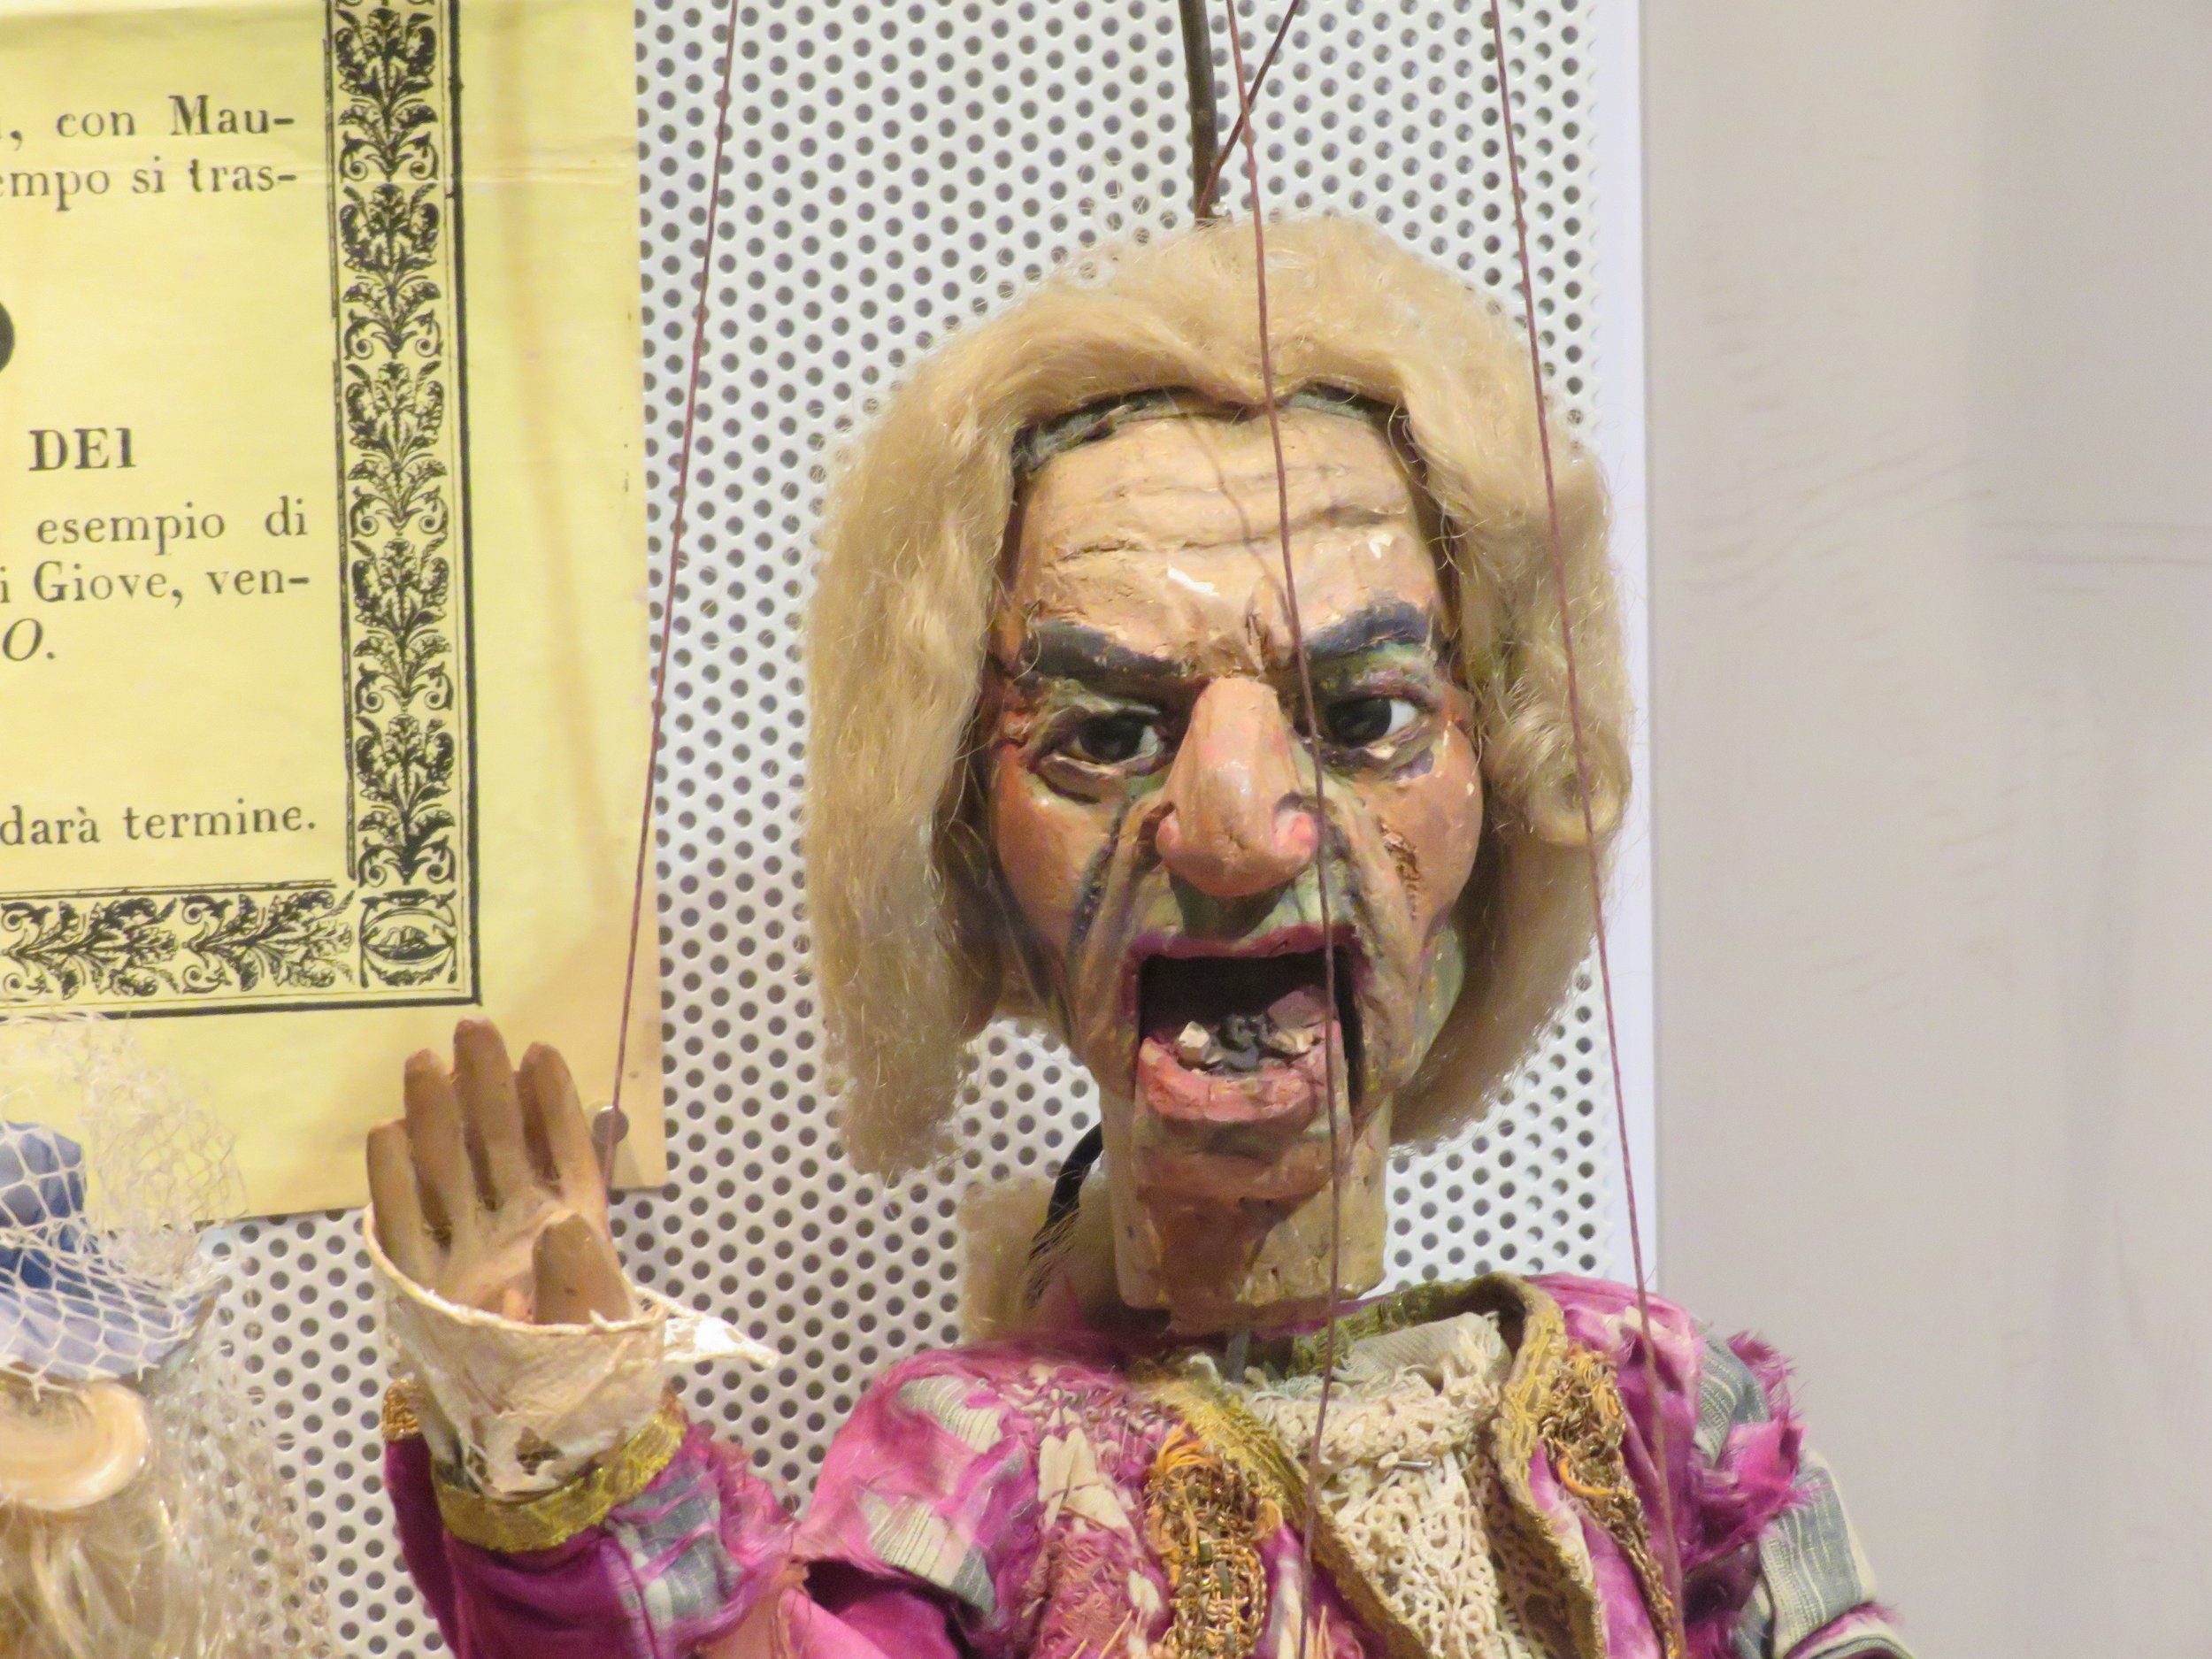 parma_puppet.JPG